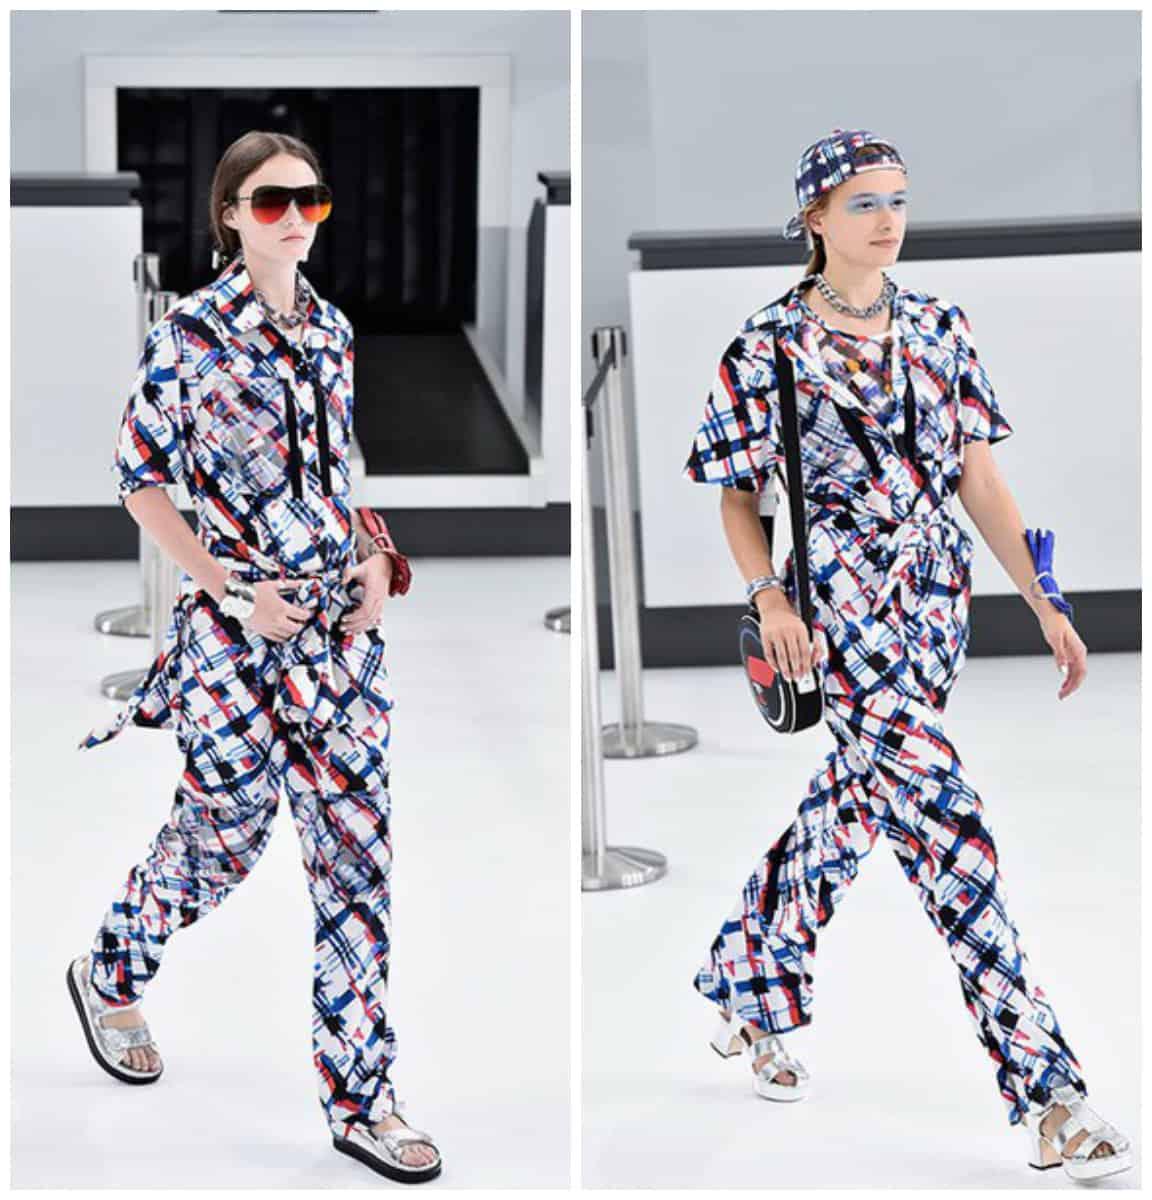 Paris-Fashion-Week-Chanel-show-Spring-Summer-2016-6